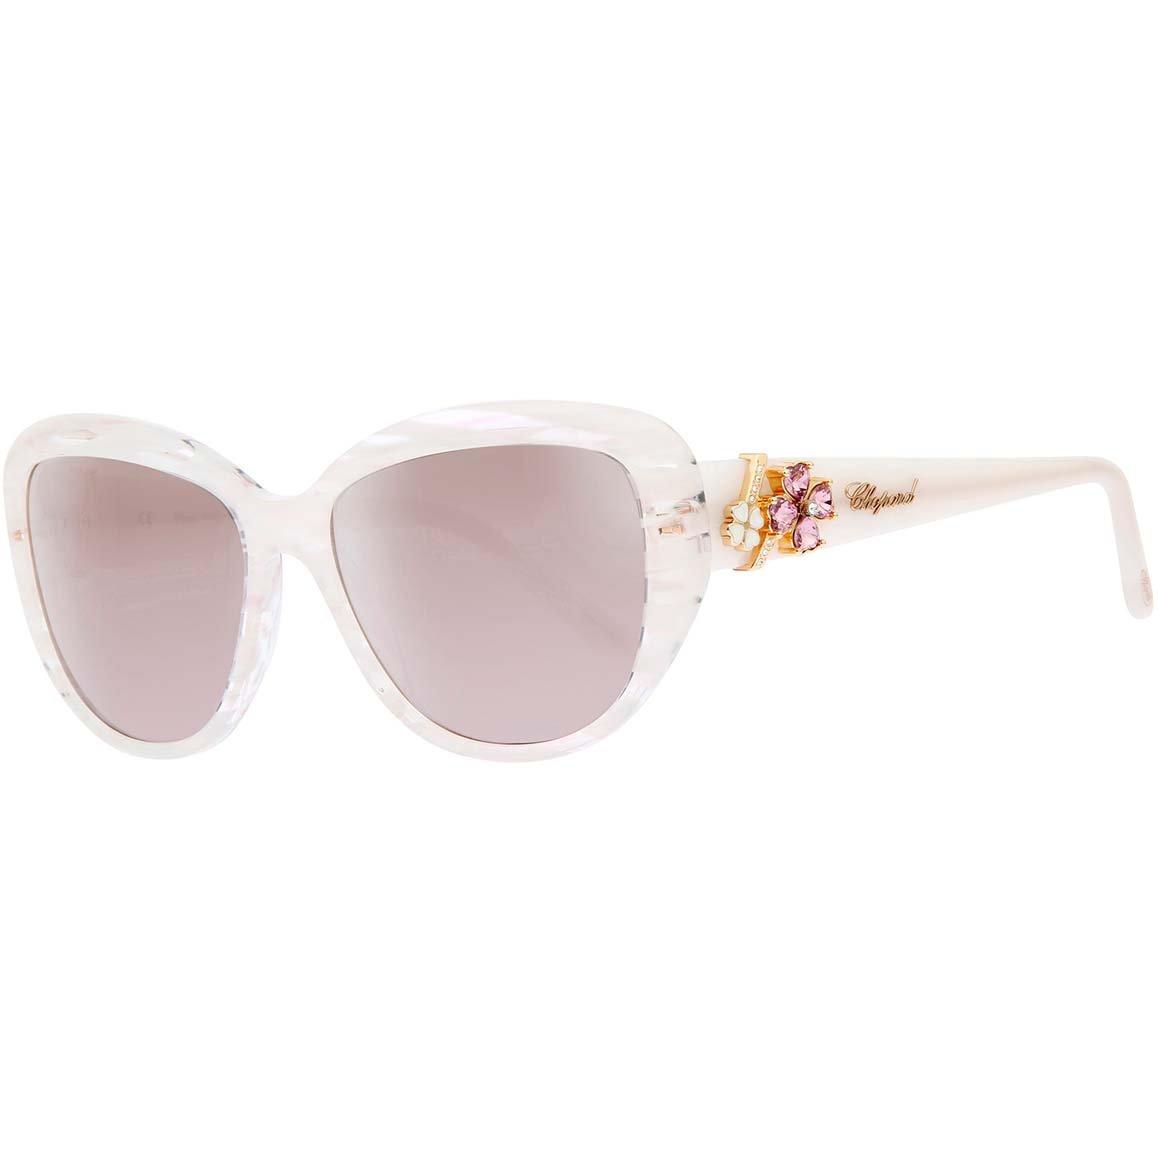 ee26ea552ffba Amazon.com: CHOPARD Women's SCH147S576UCX Sunglasses: Clothing